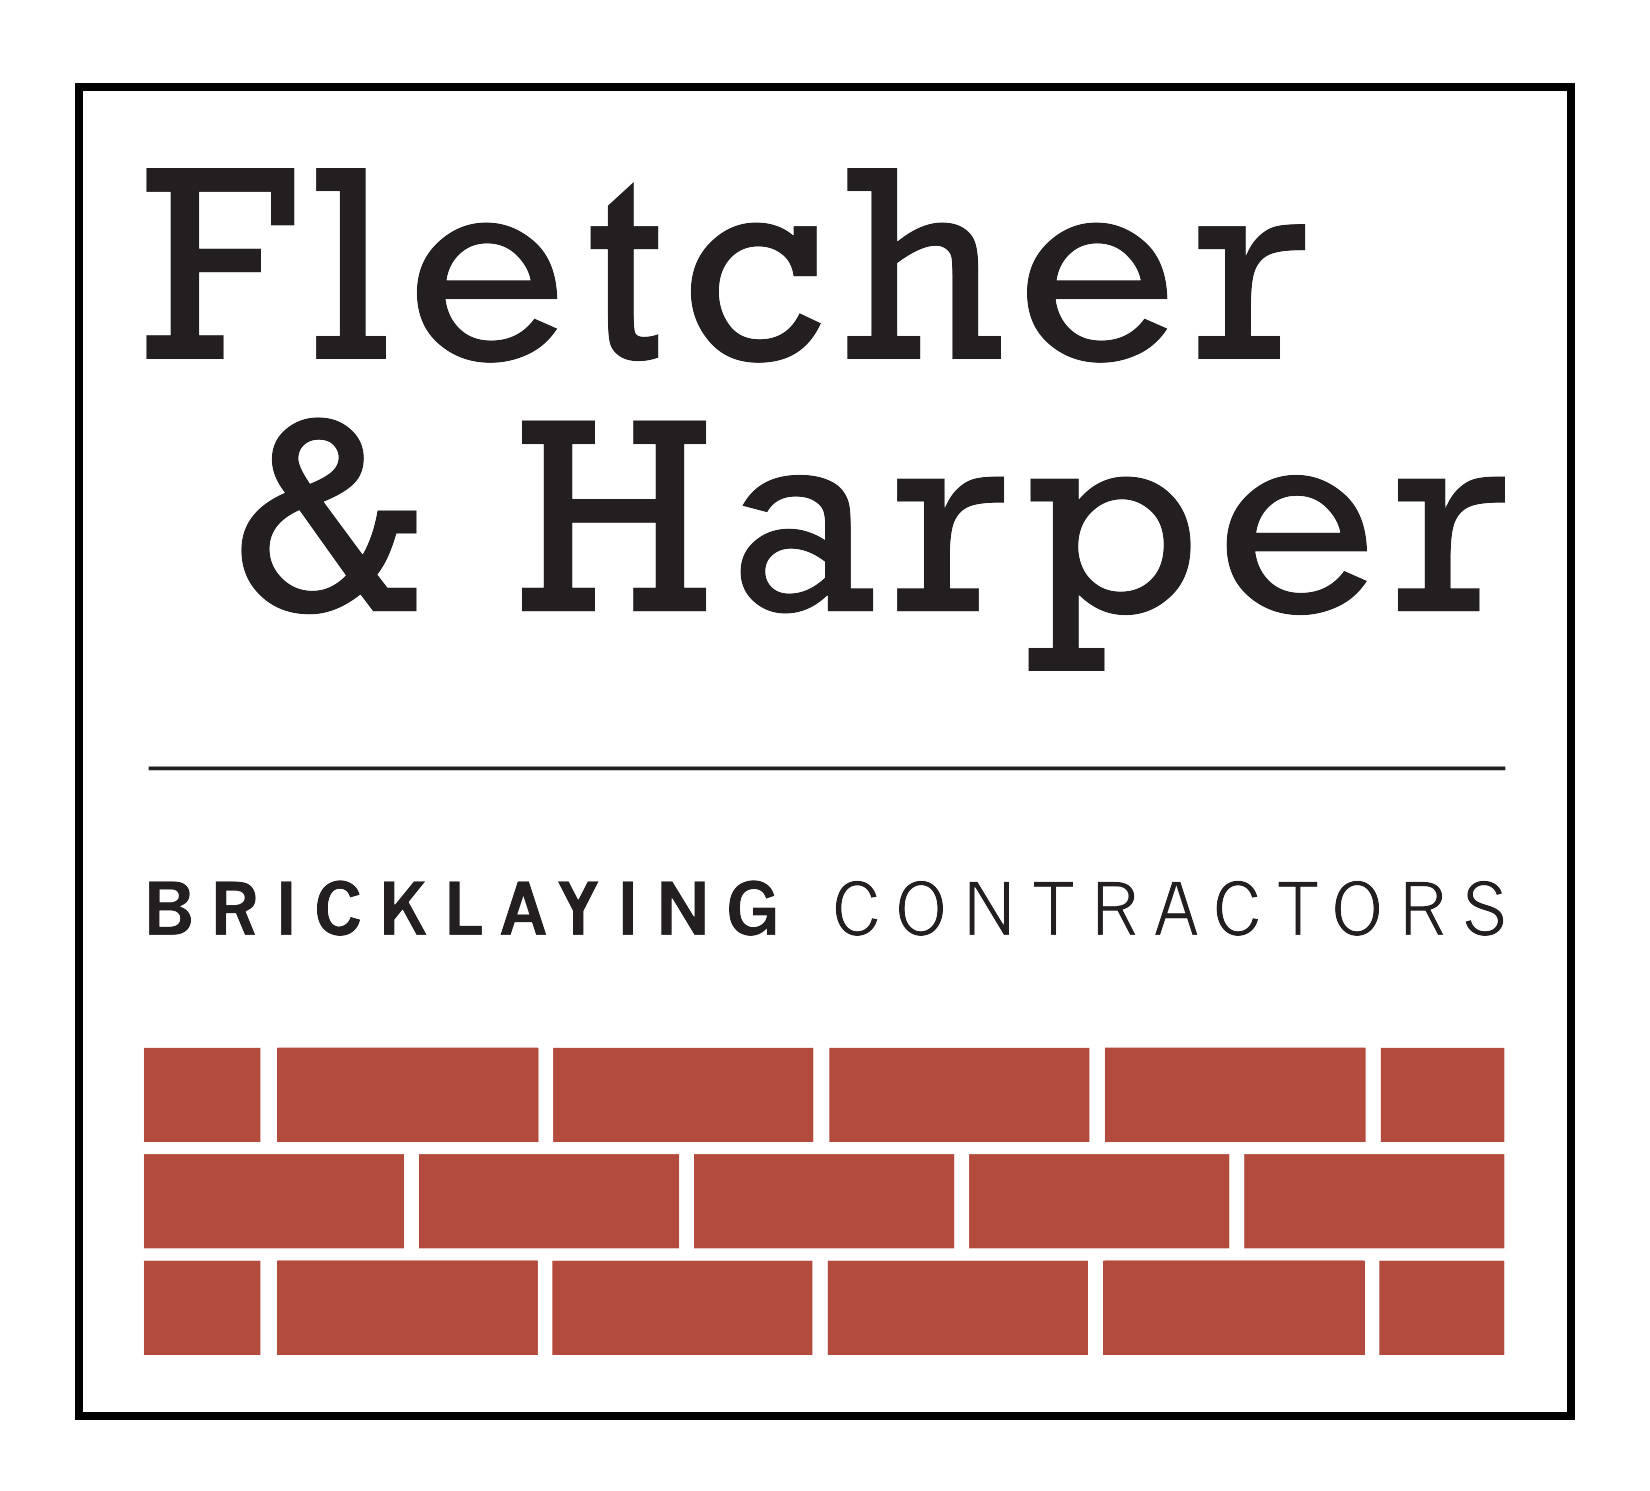 Fletcher Harper Bricklaying Contractors